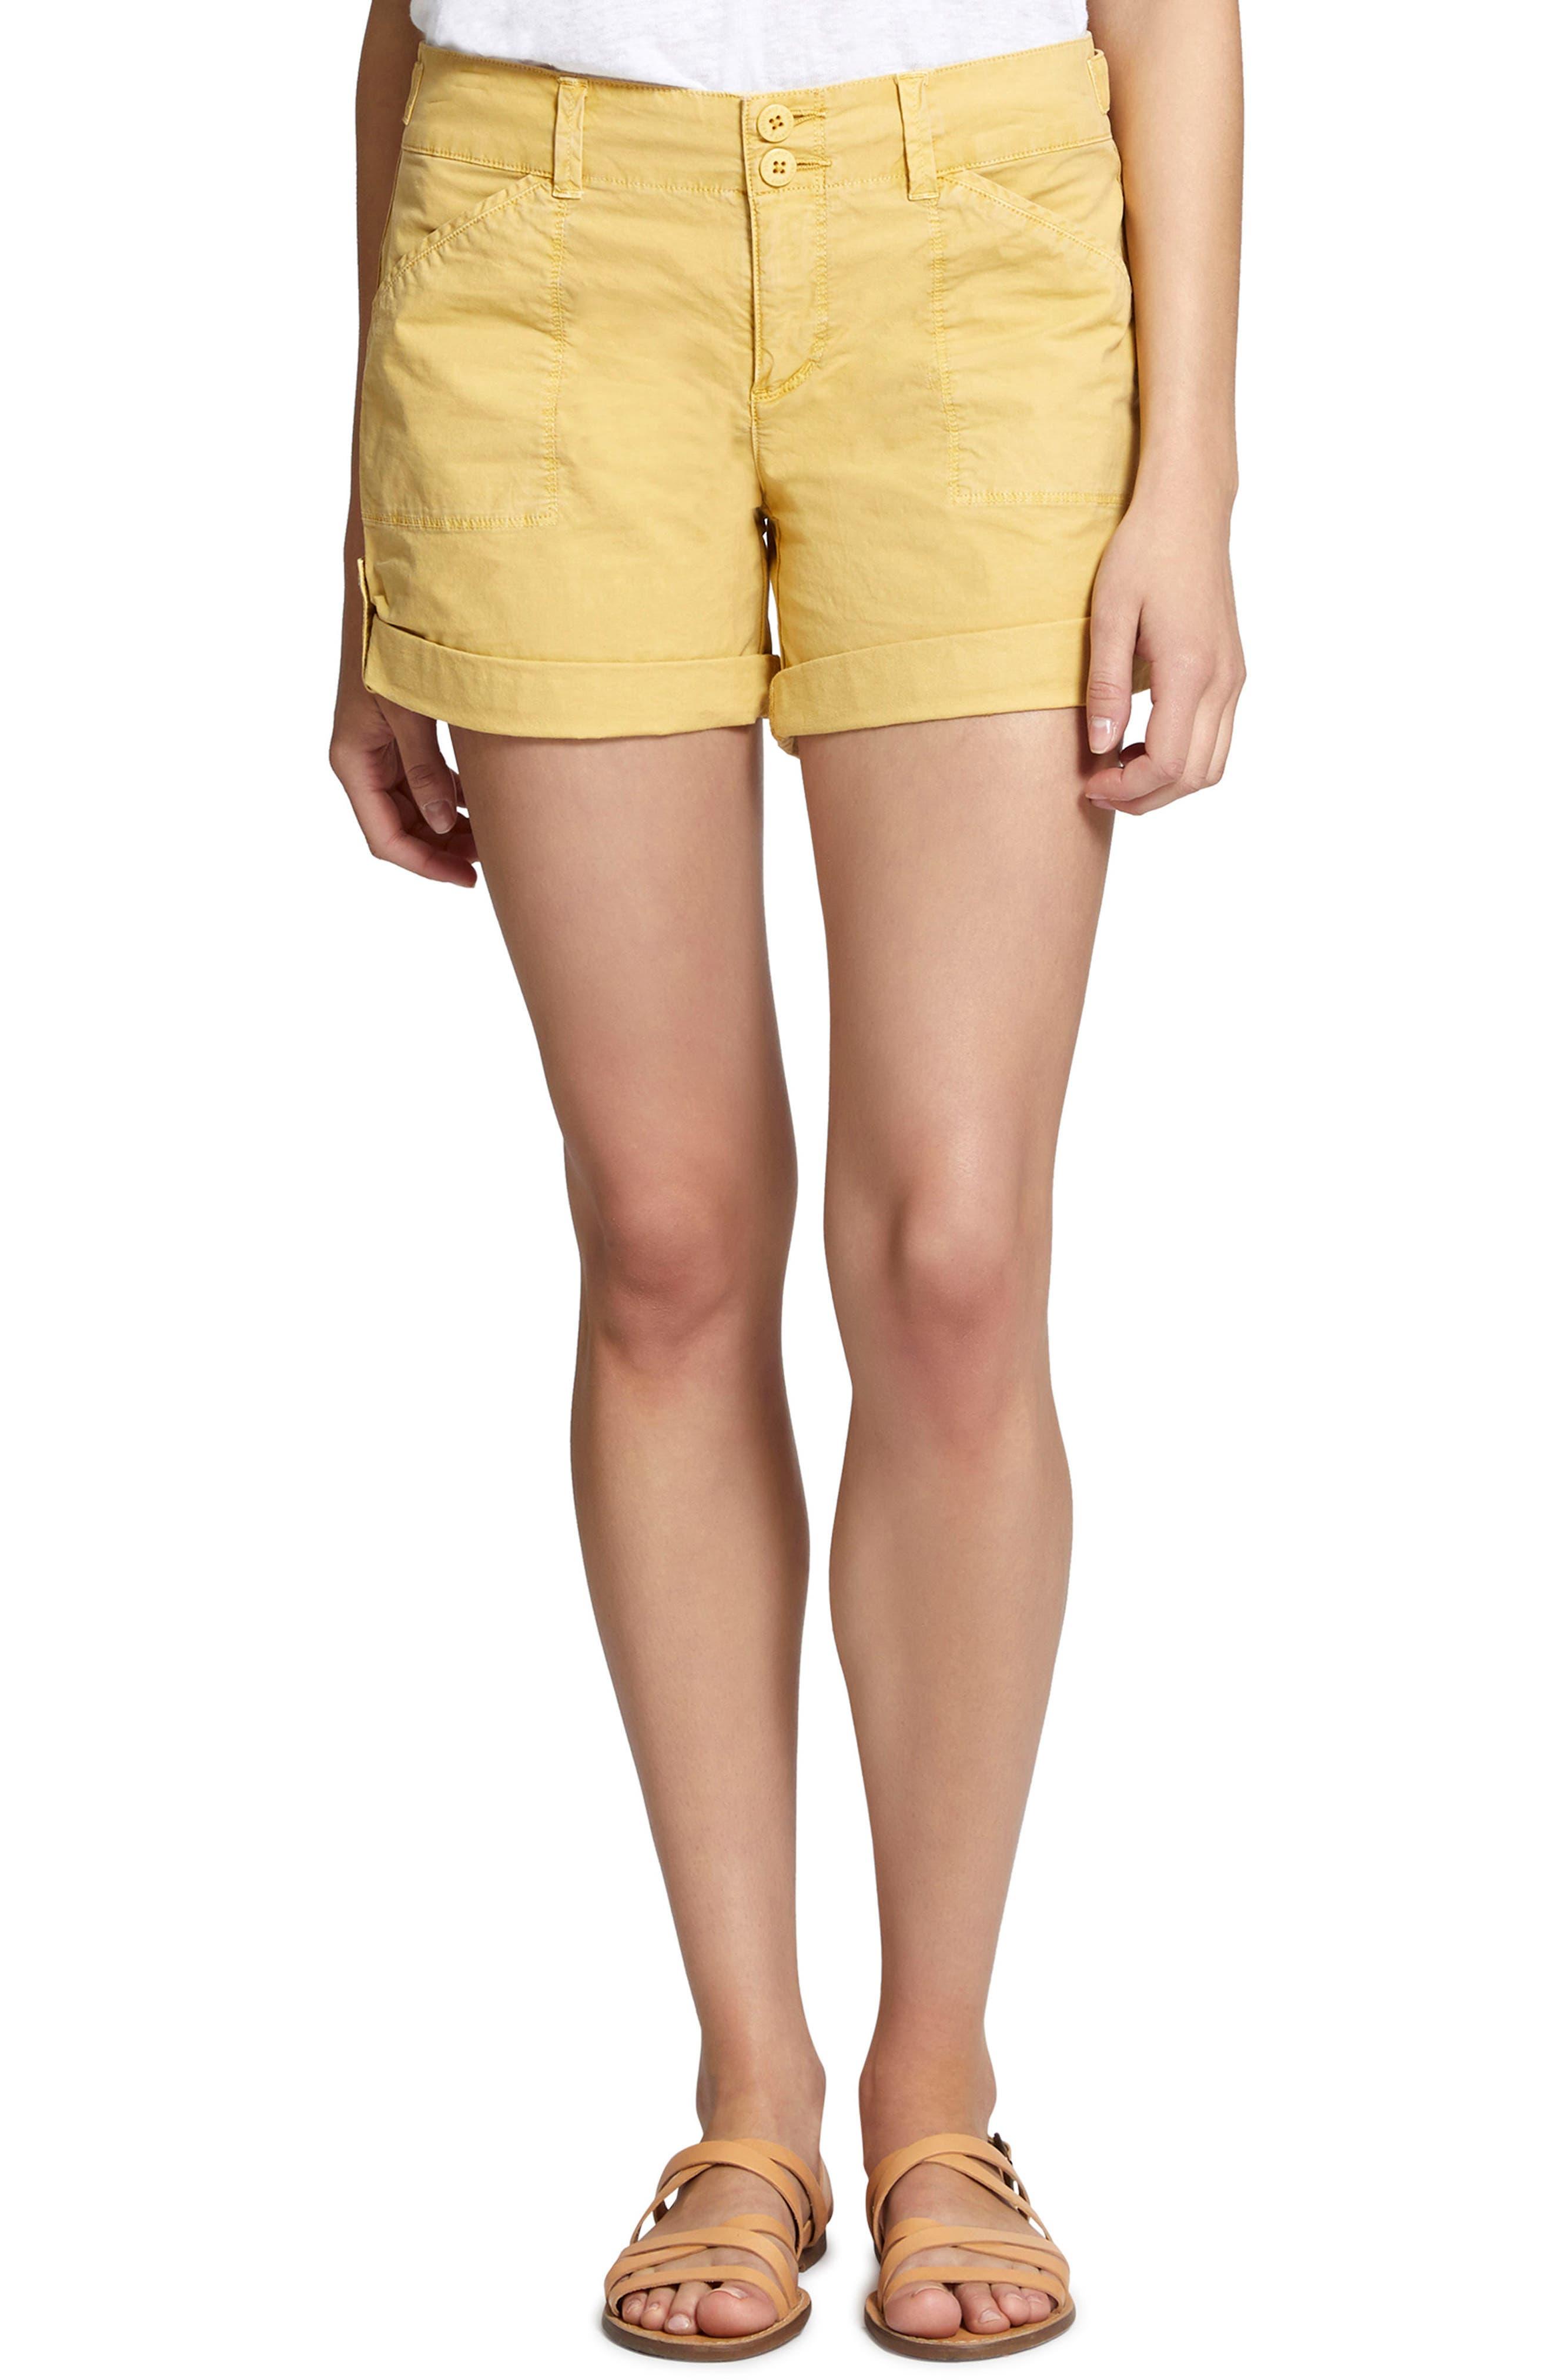 Wanderer Cargo Shorts,                         Main,                         color, 770